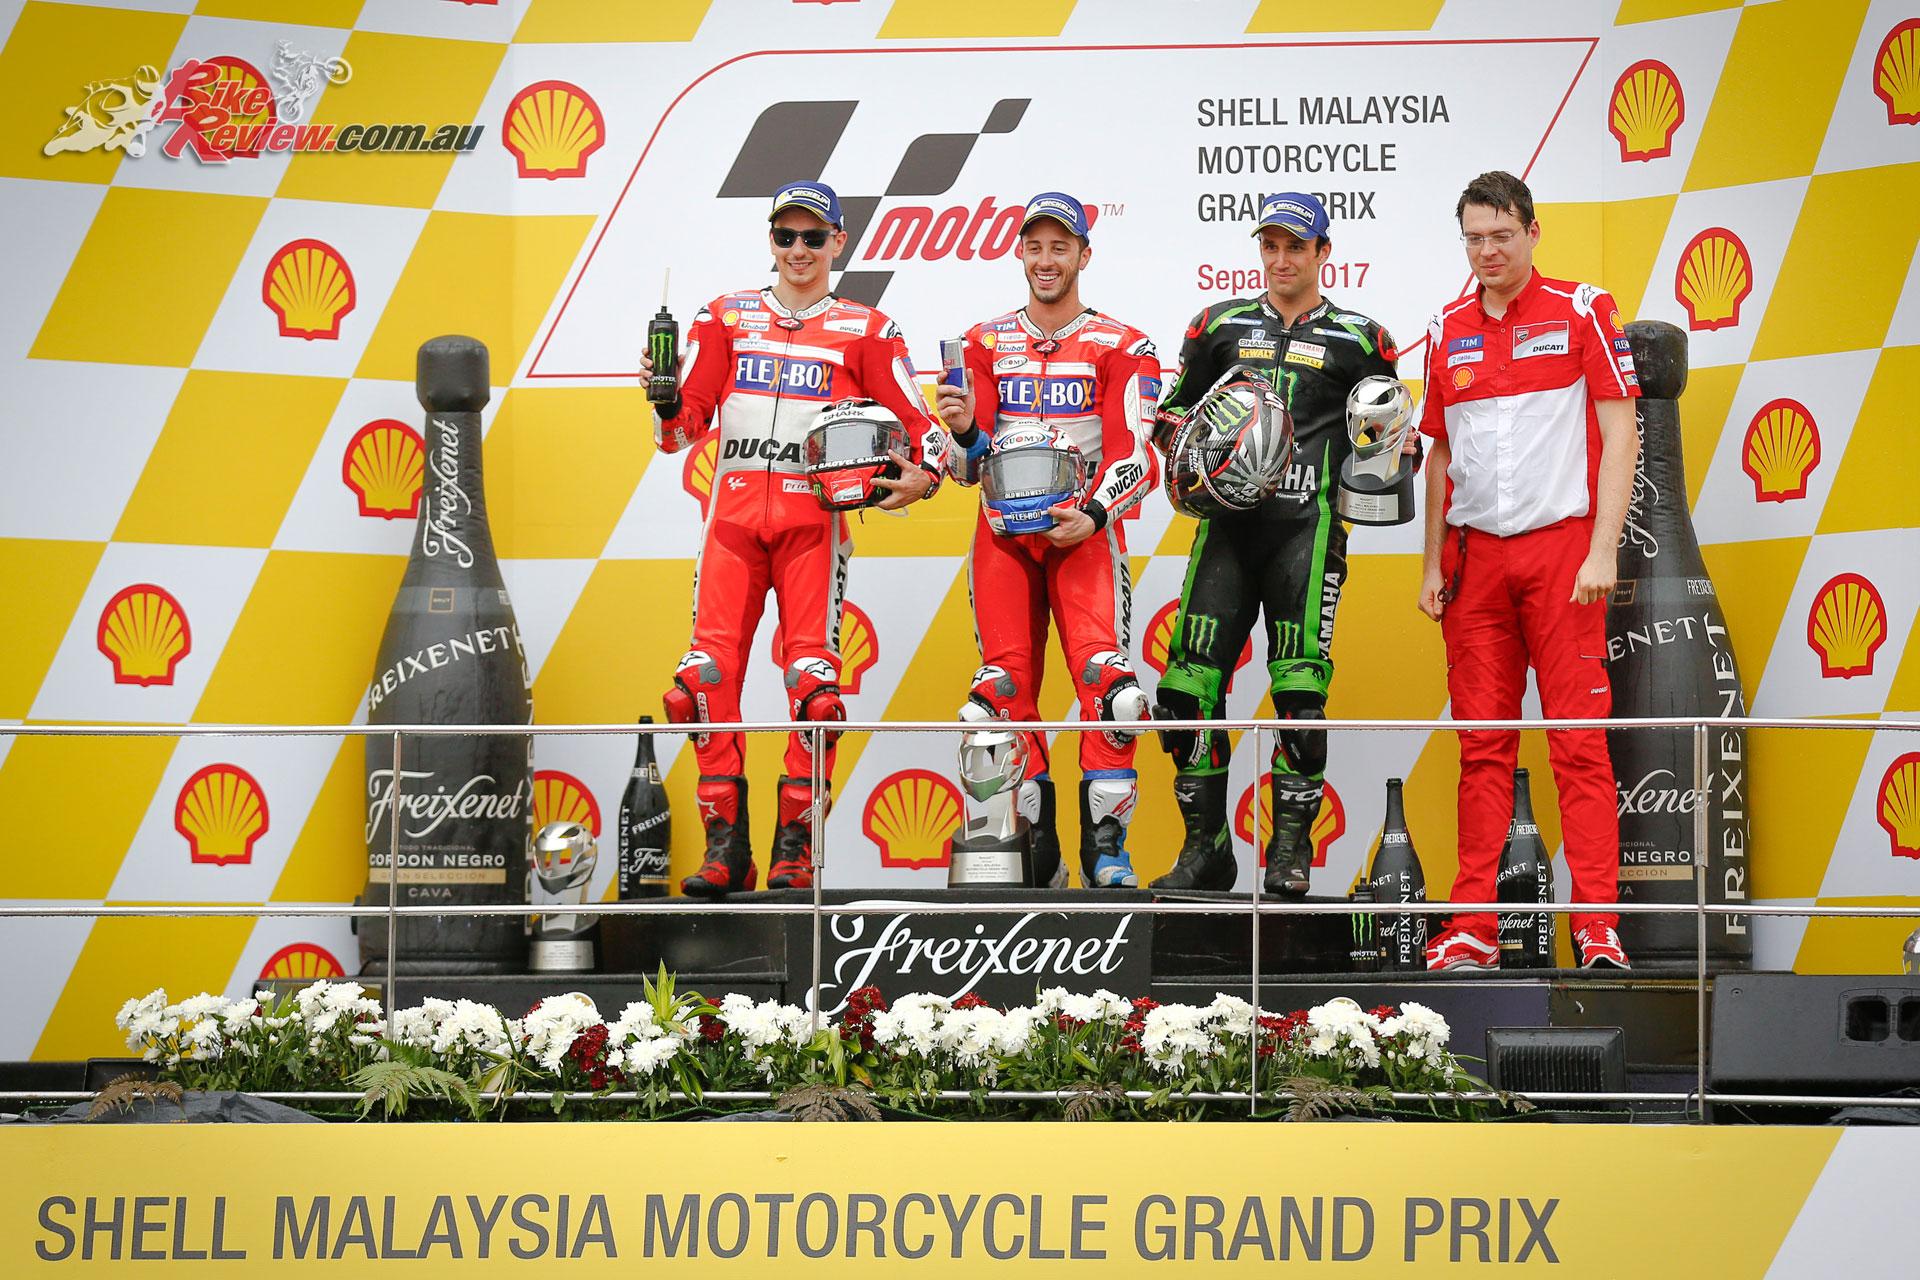 The dual Ducati podium at Sepang, with Johann Zarco third